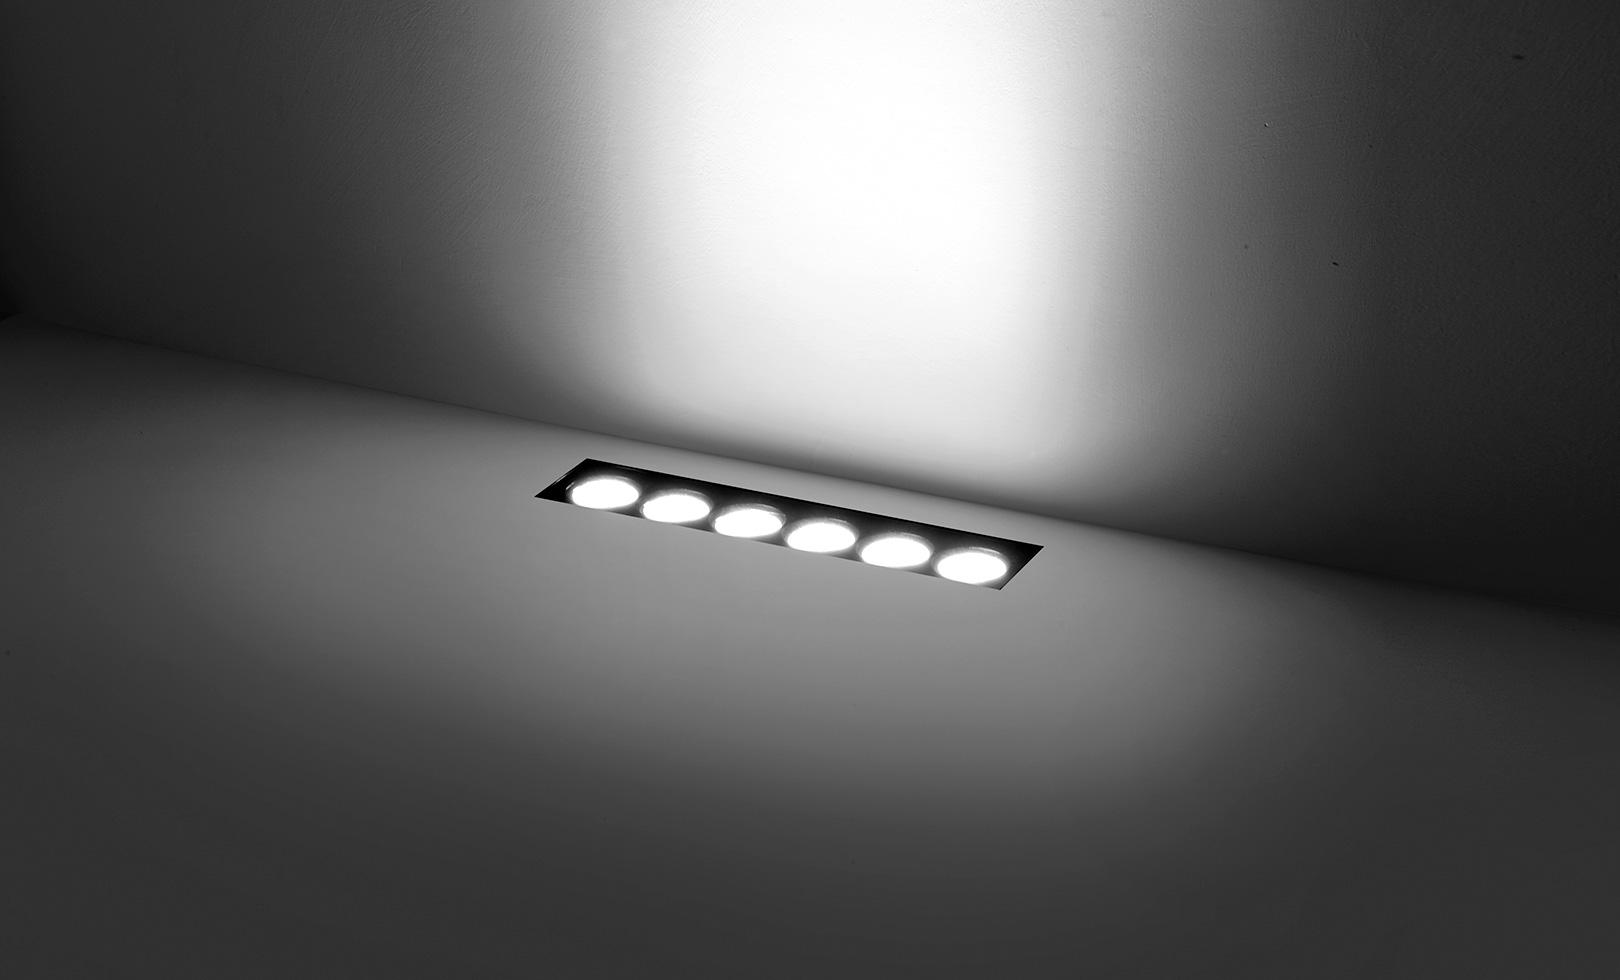 205002 HYDROFLOOR VETRO LINEAR LED 10W 1